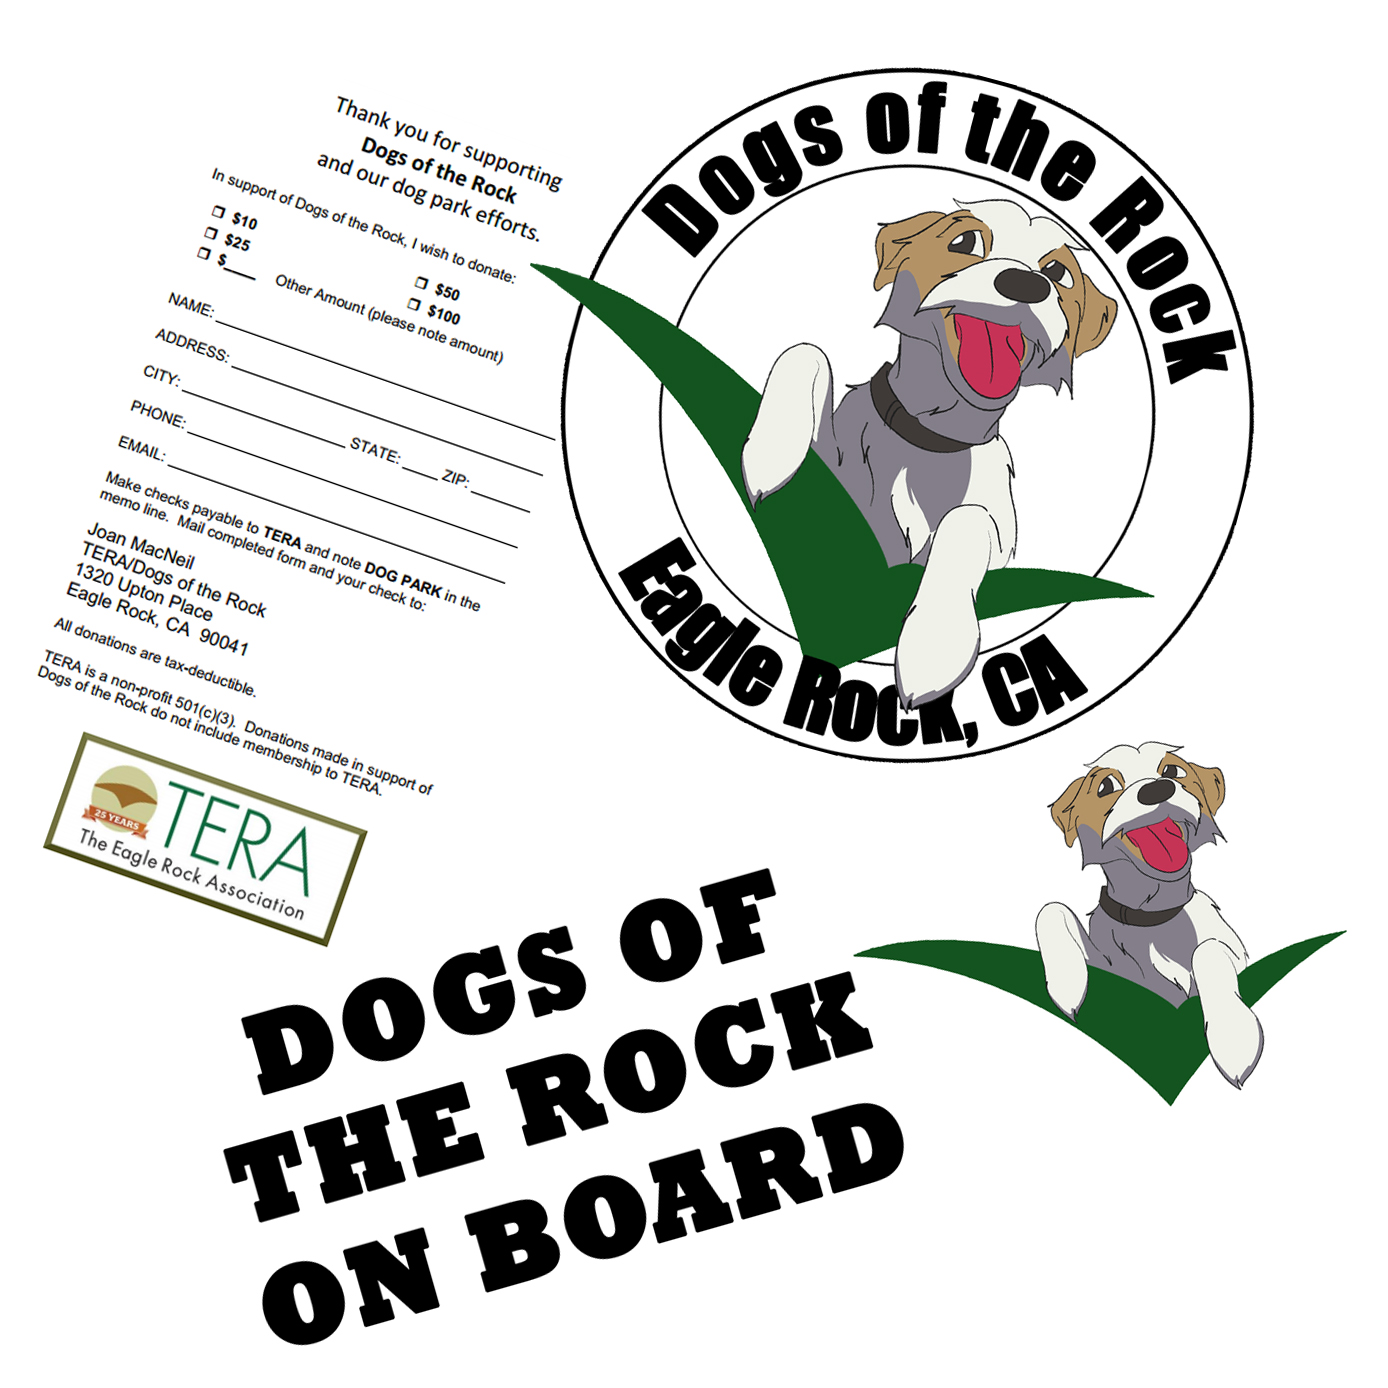 Dogs of the Rock - Eagle Rock CA.jpg